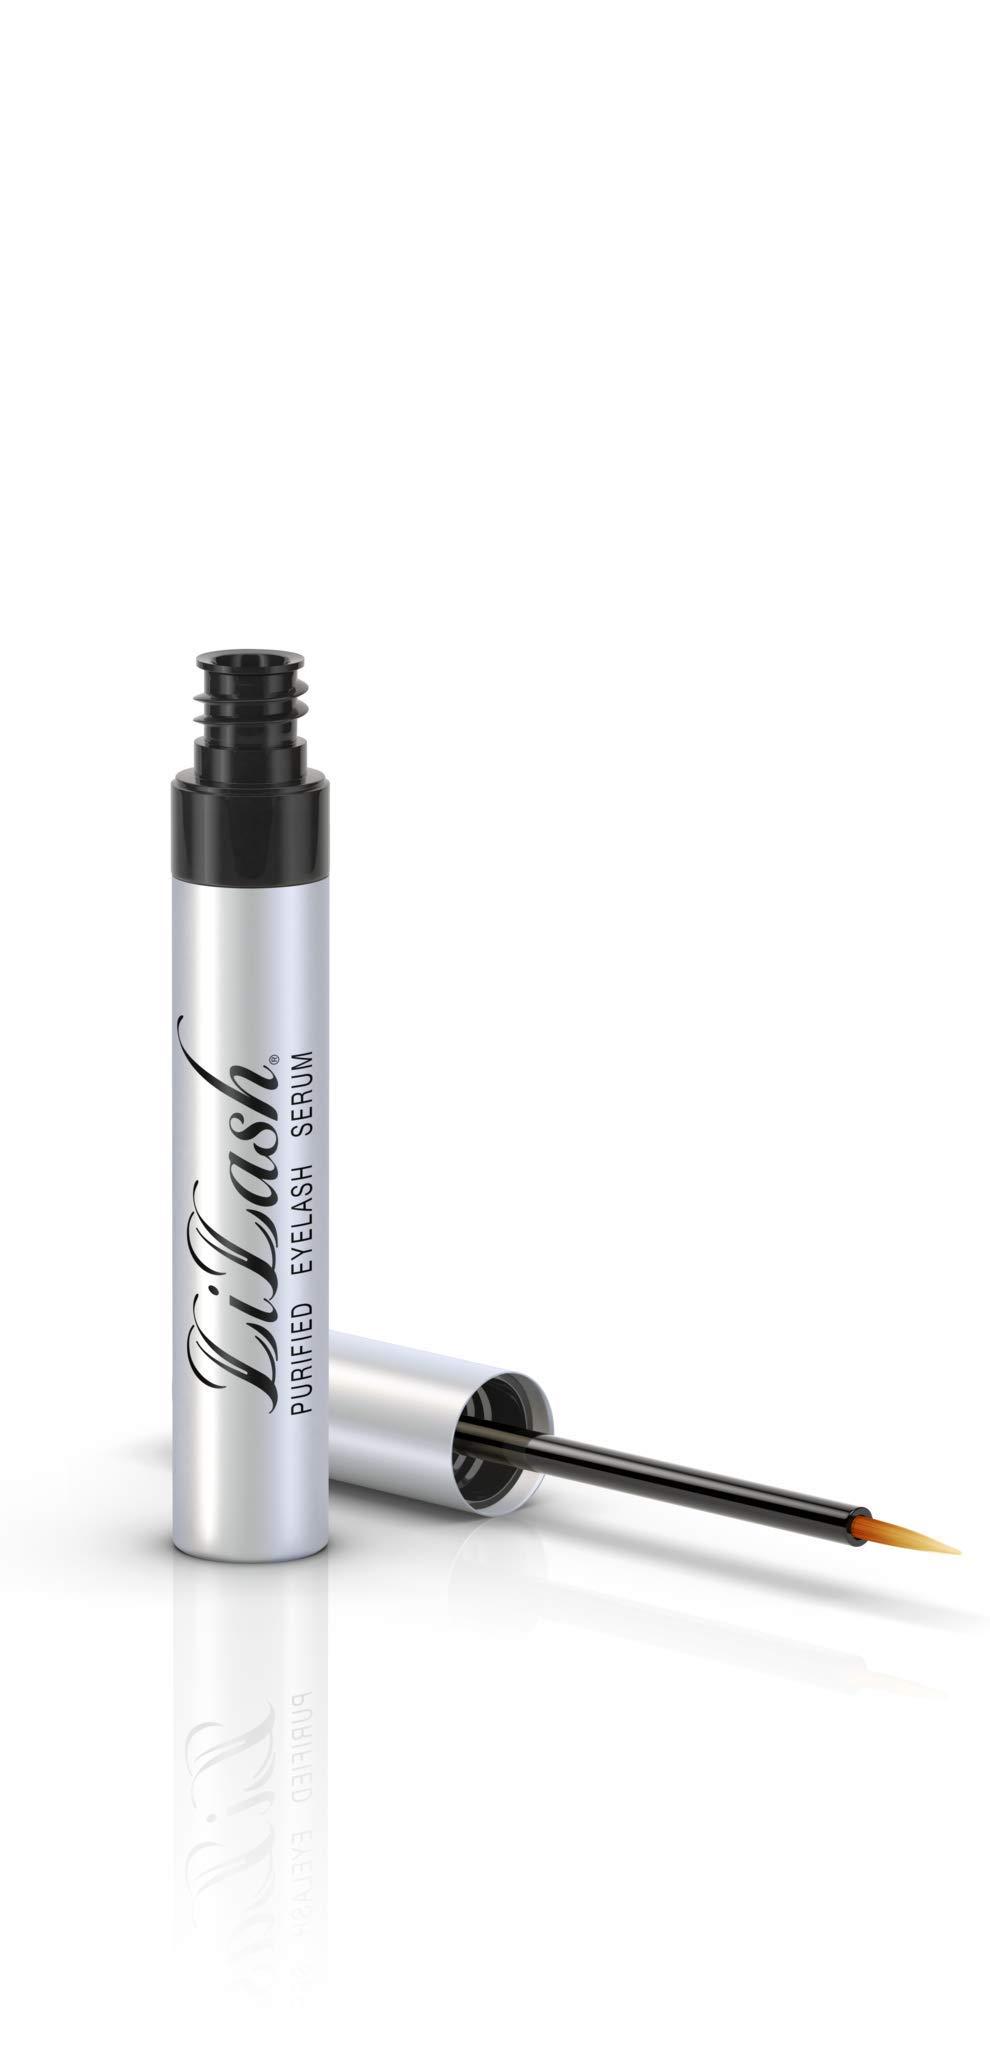 LiLash Purified Eyelash Serum | Natural Eyelash Enhancer | Use For 90 Days For Full Results by LiLash